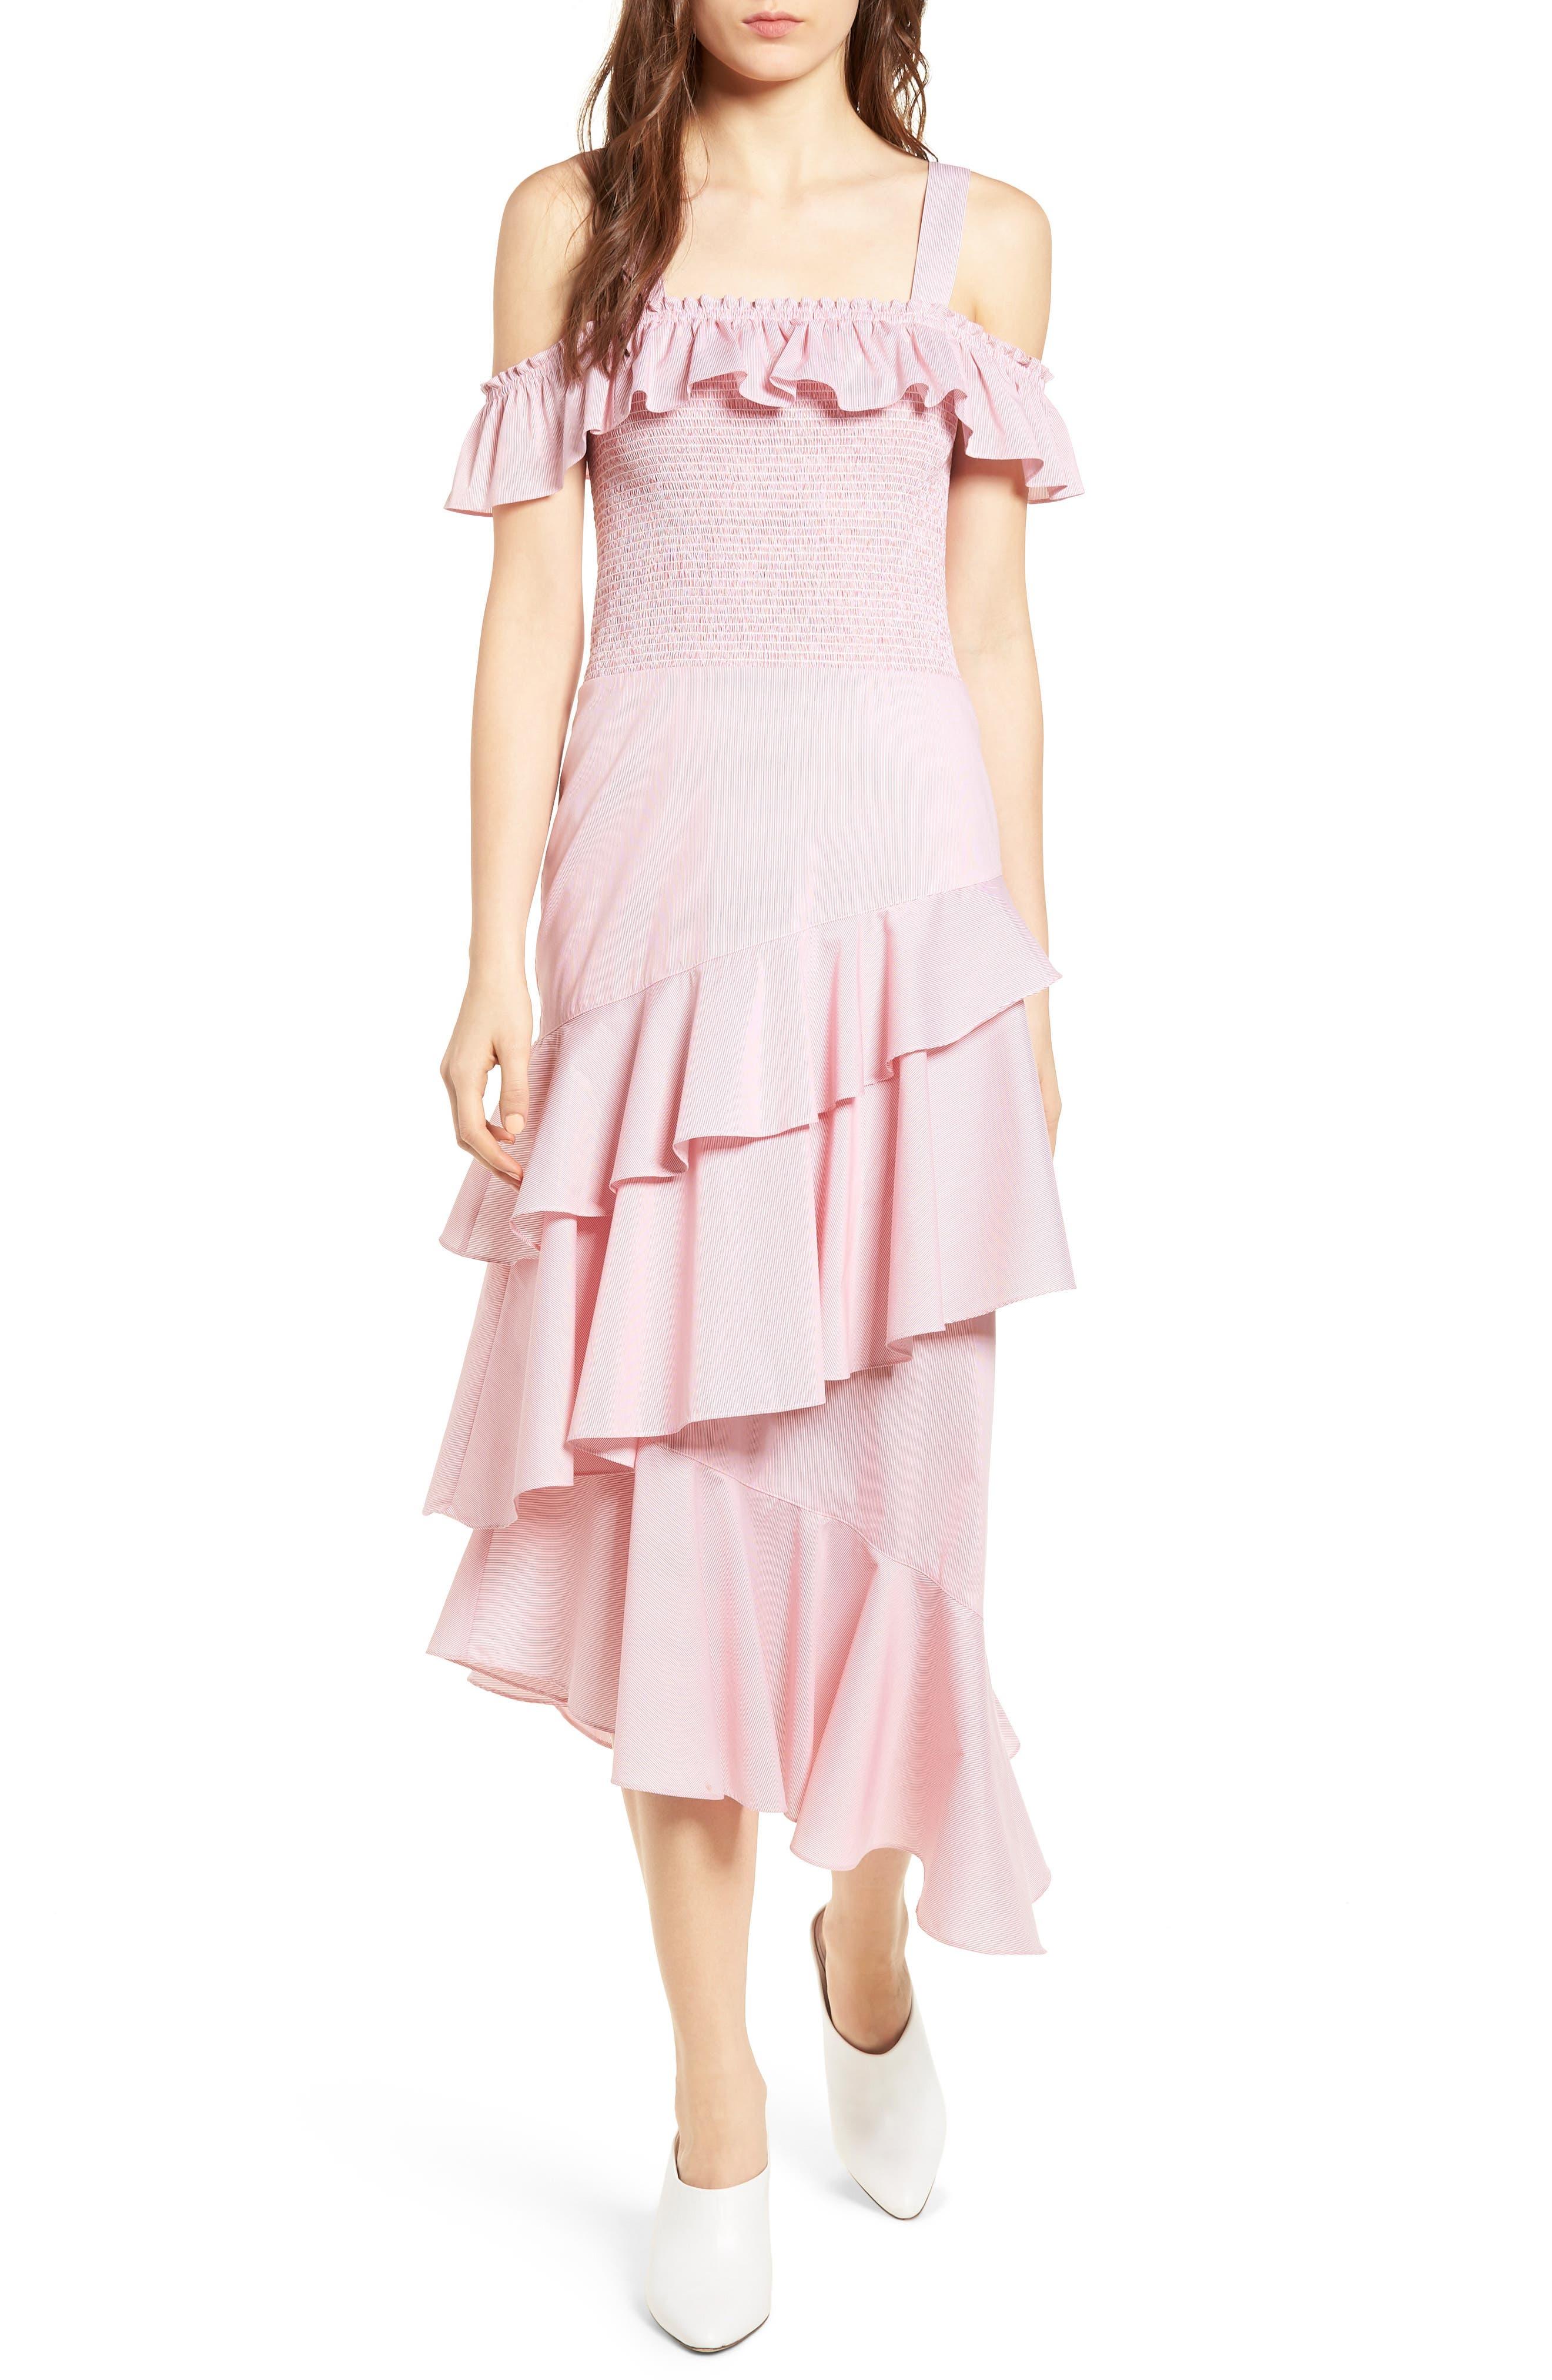 Alternate Image 1 Selected - Chelsea28 Ruffle Smocked Cold Shoulder Dress